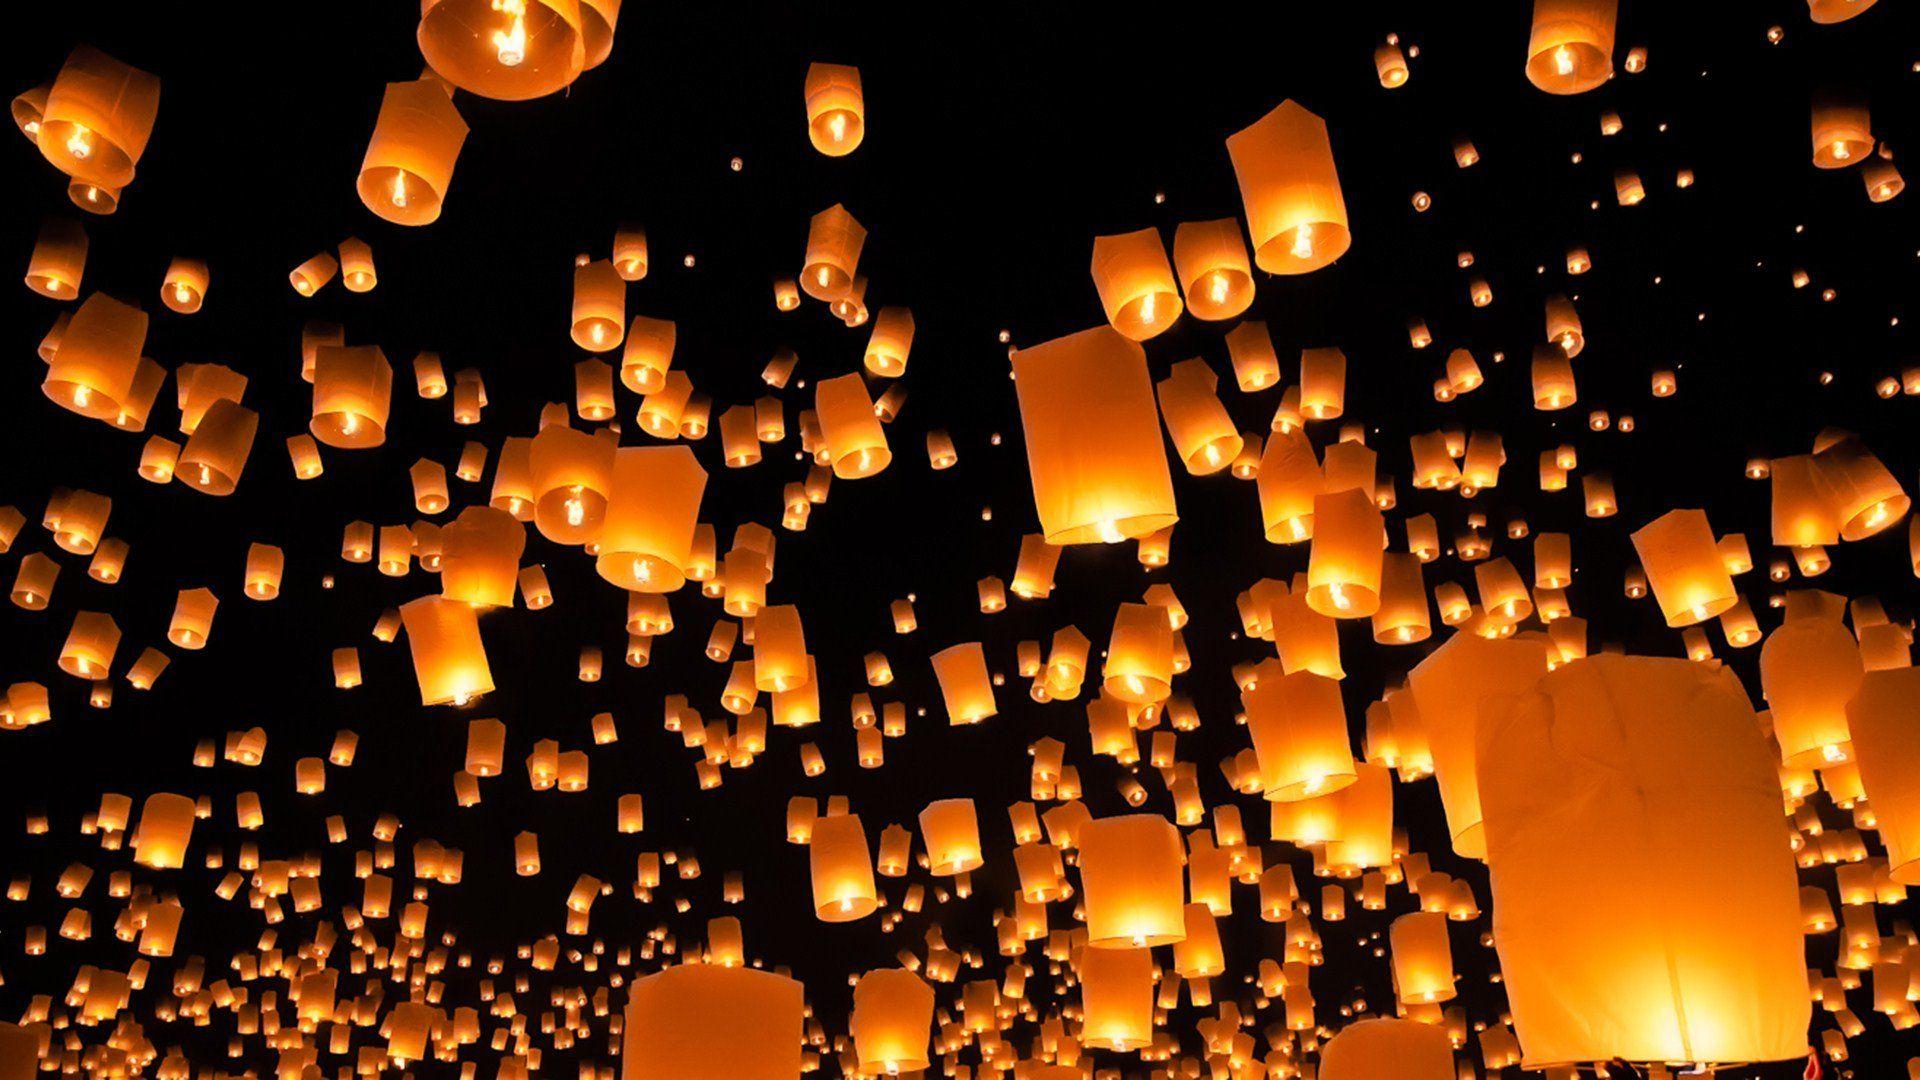 Beautiful Light In The Night City Lights Wallpaper Lit Wallpaper Floating Lanterns